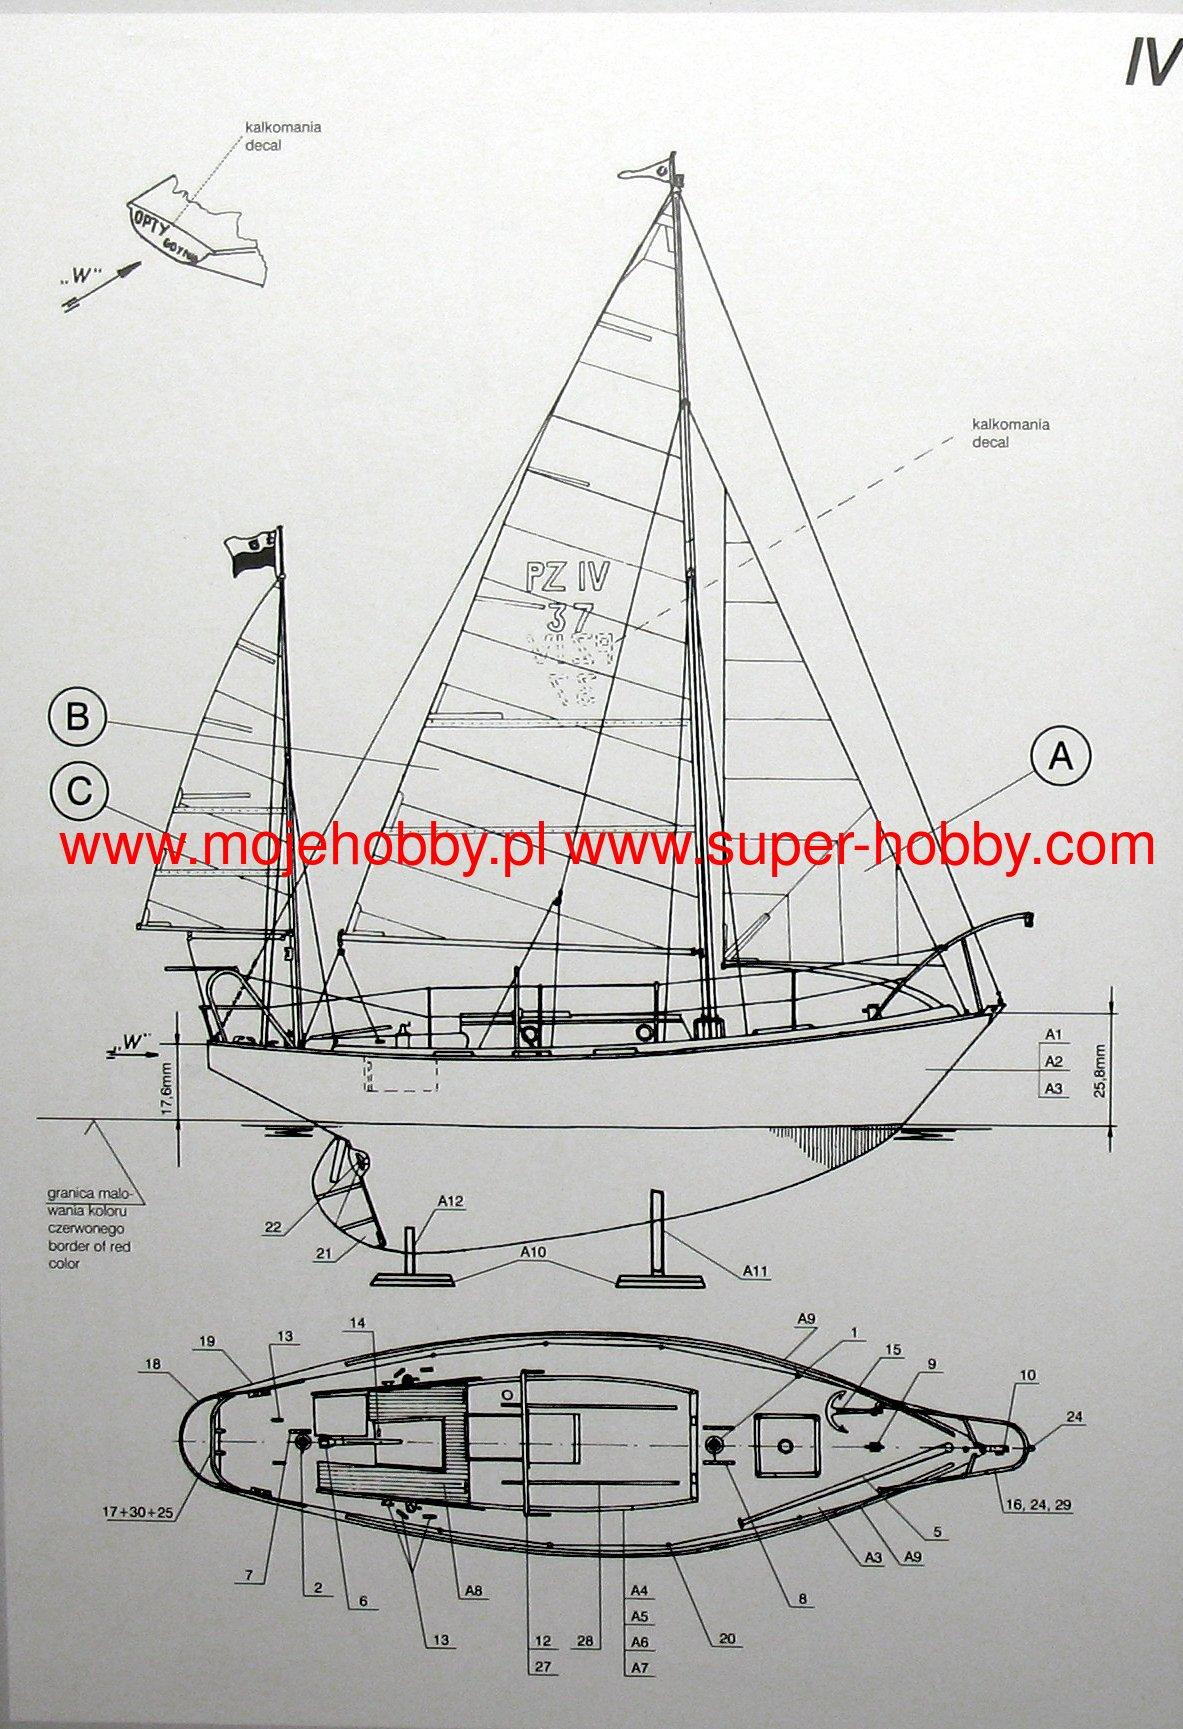 Mirage Hobby 508002 Modellbausatz S//Y OPTY Polish Sailing Yacht